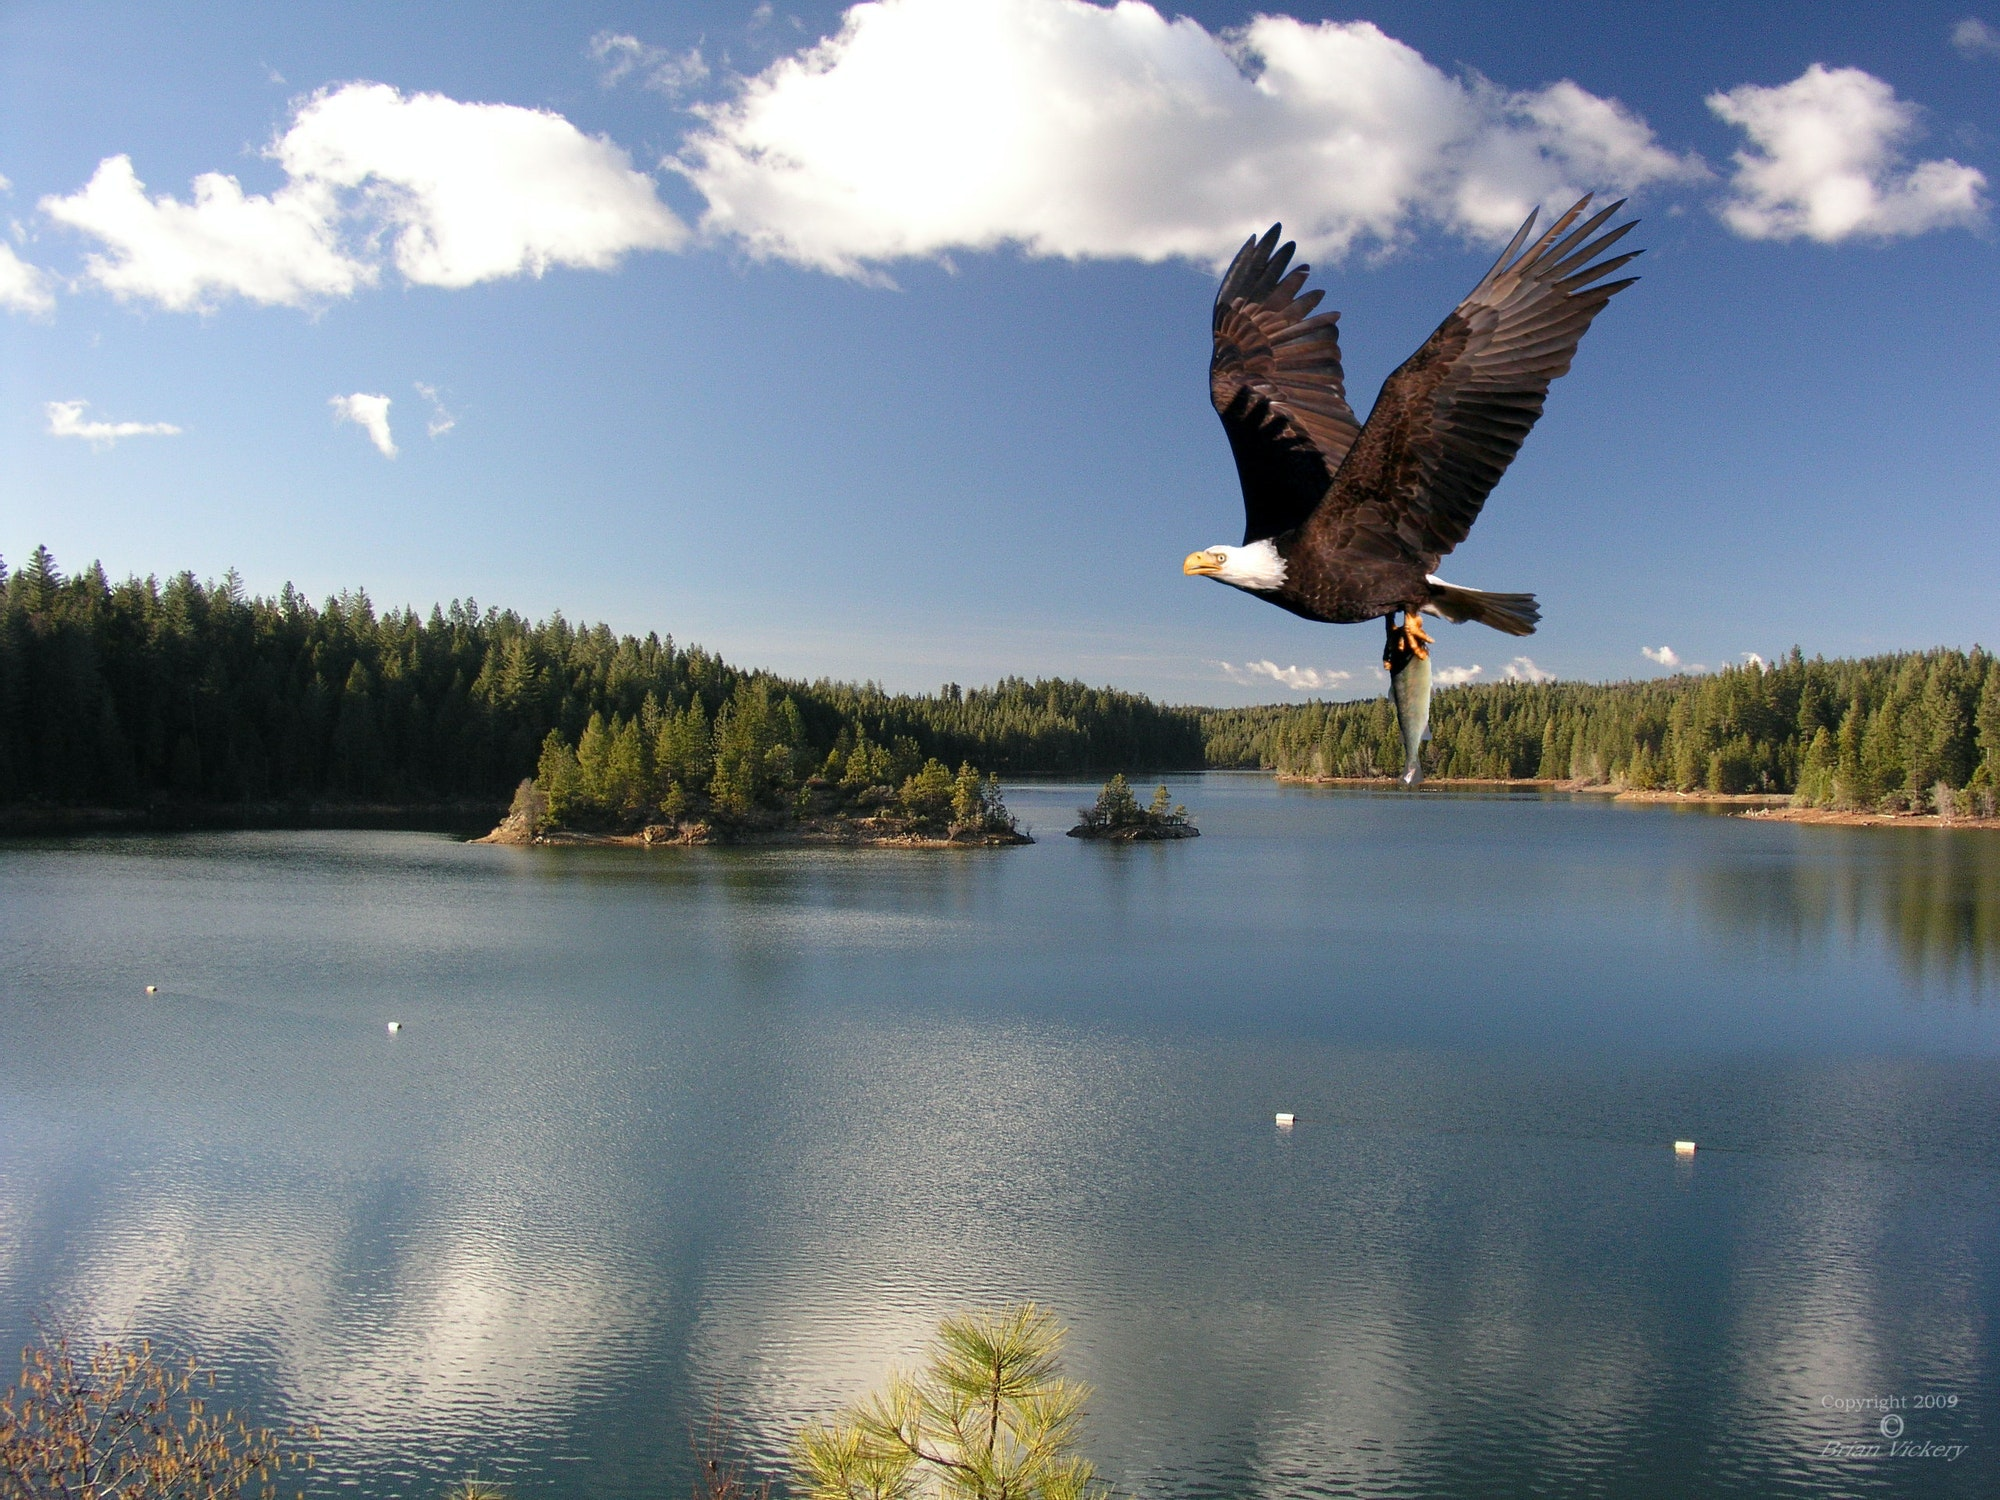 May contain: bird, animal, eagle, and bald eagle